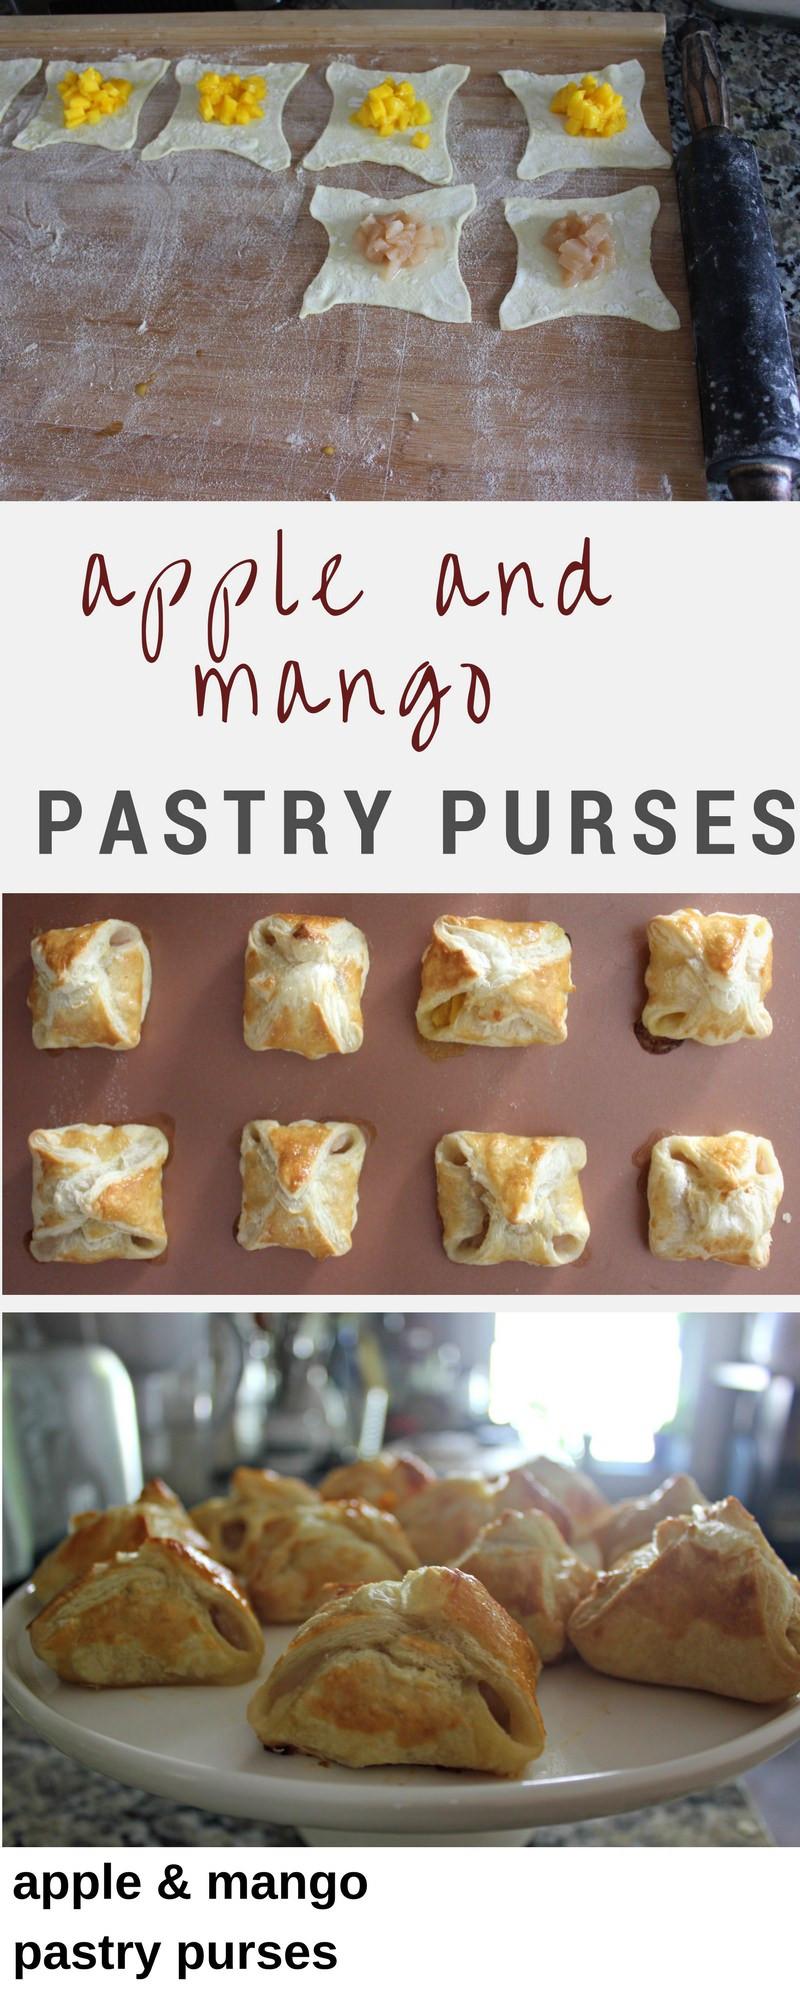 apple and mango pastry purses recipe